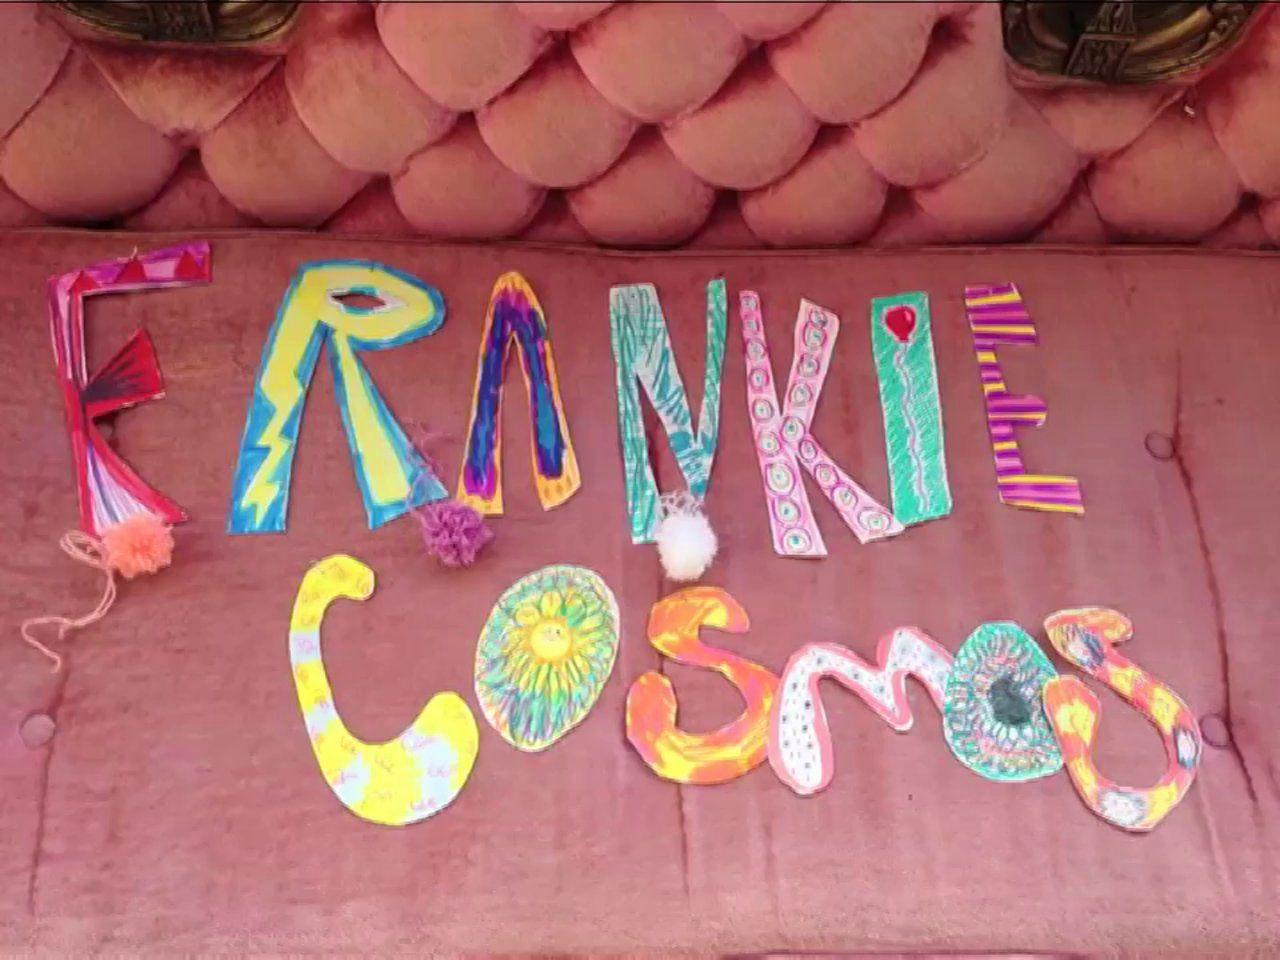 Frankie Cosmos – Buses